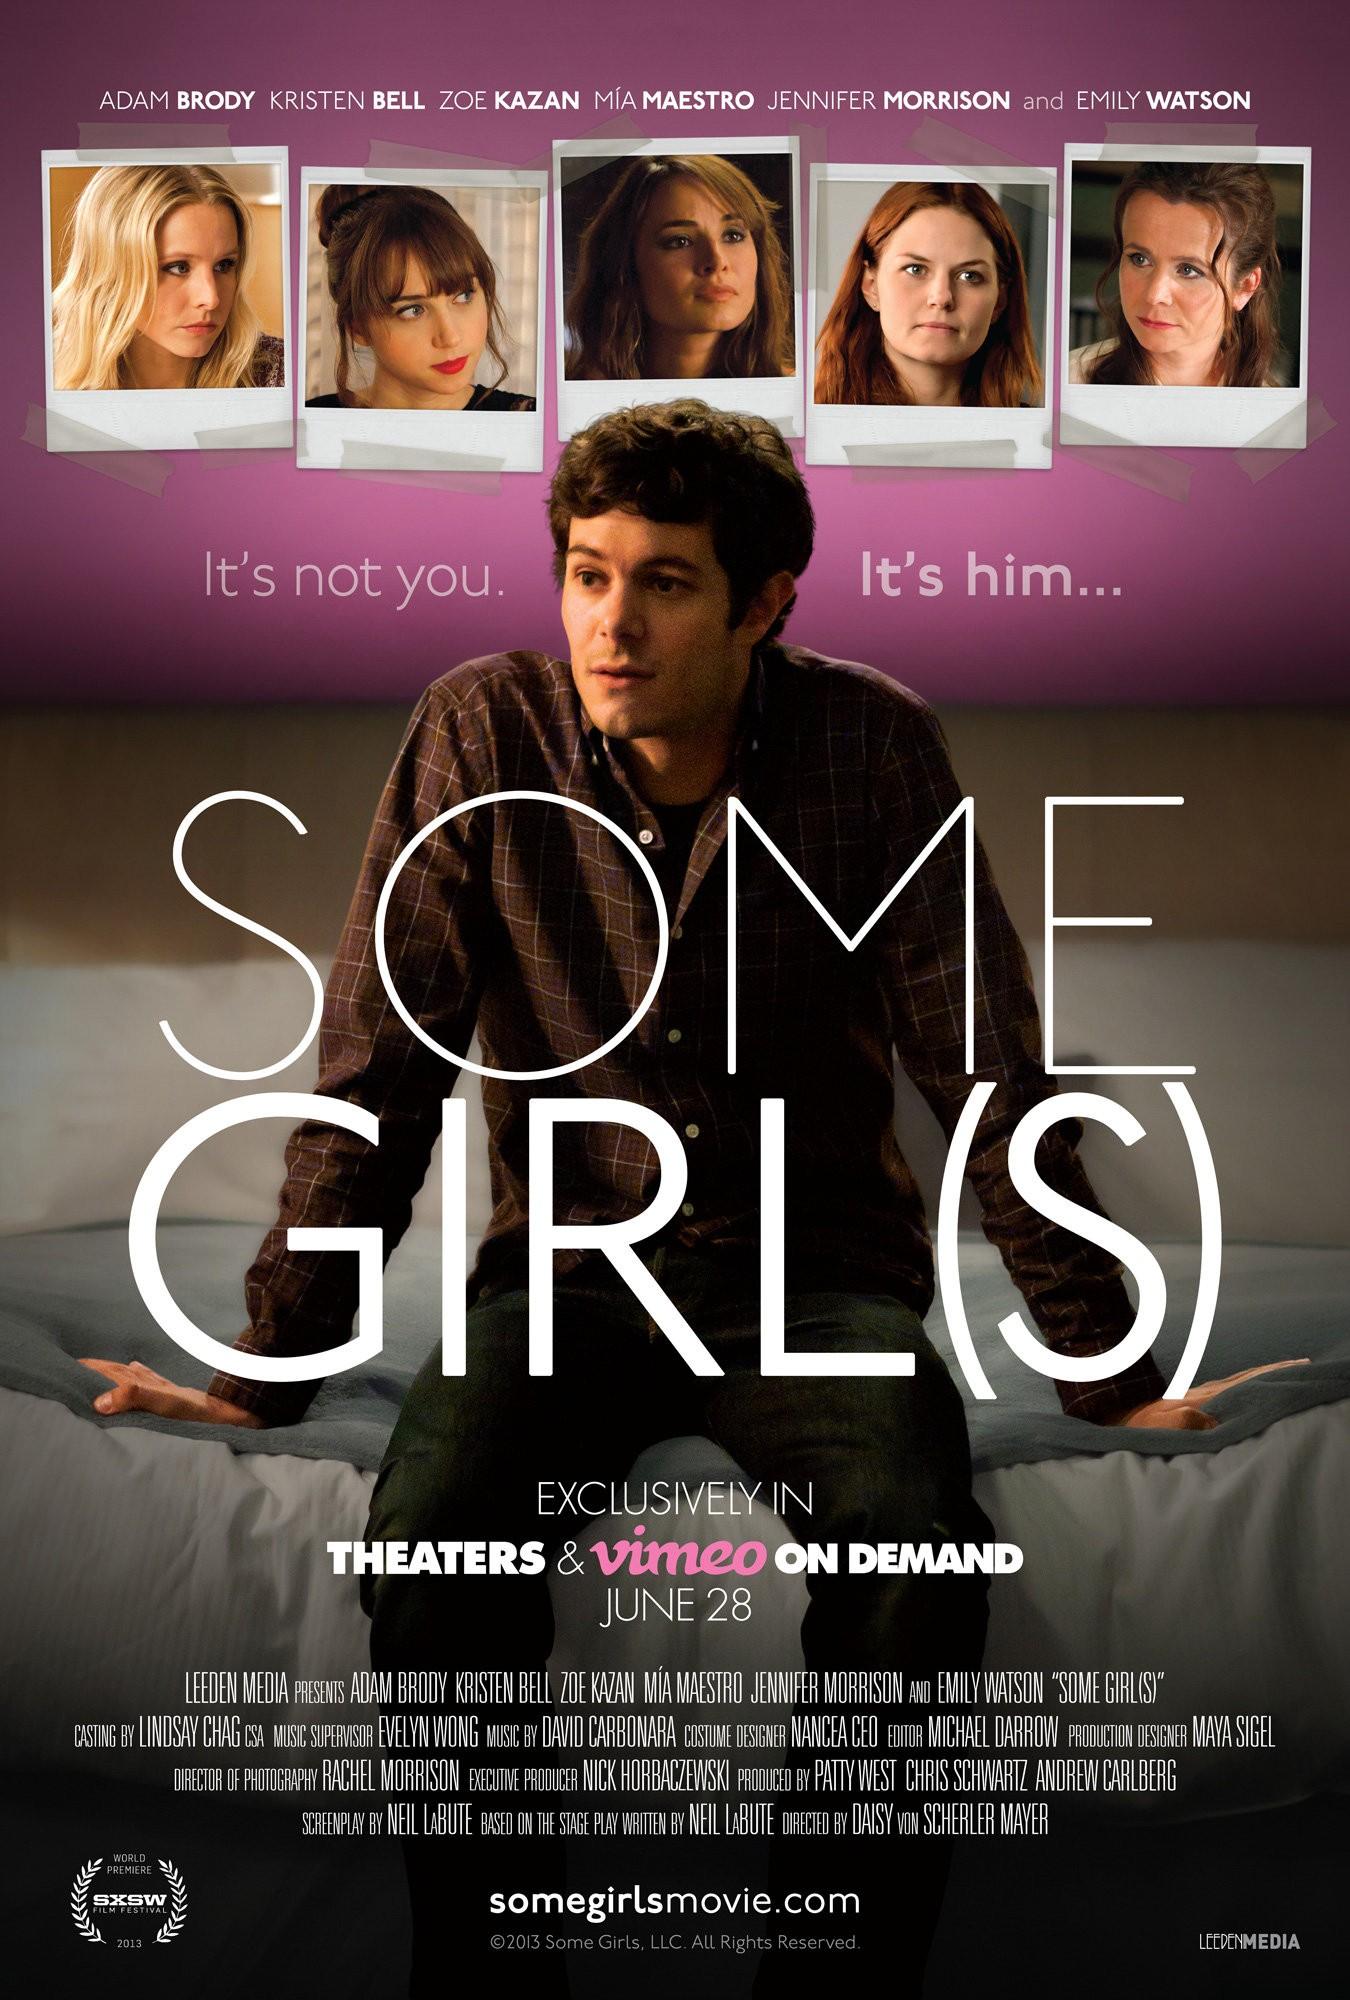 affiche du film Some Girl(s)